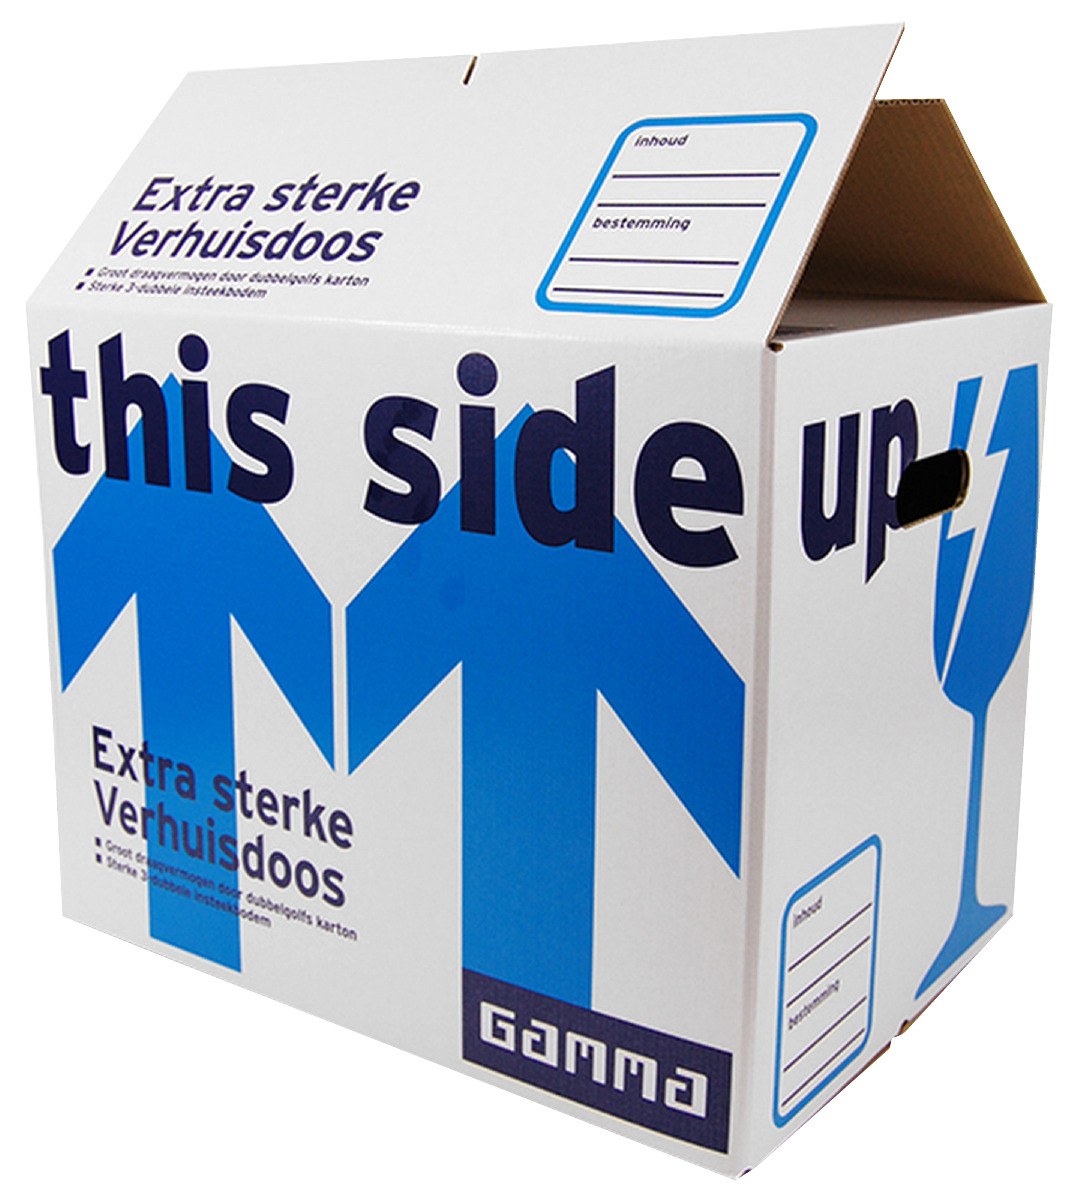 GAMMA verhuisdoos extra sterk karton wit 47,5x32x35 cm